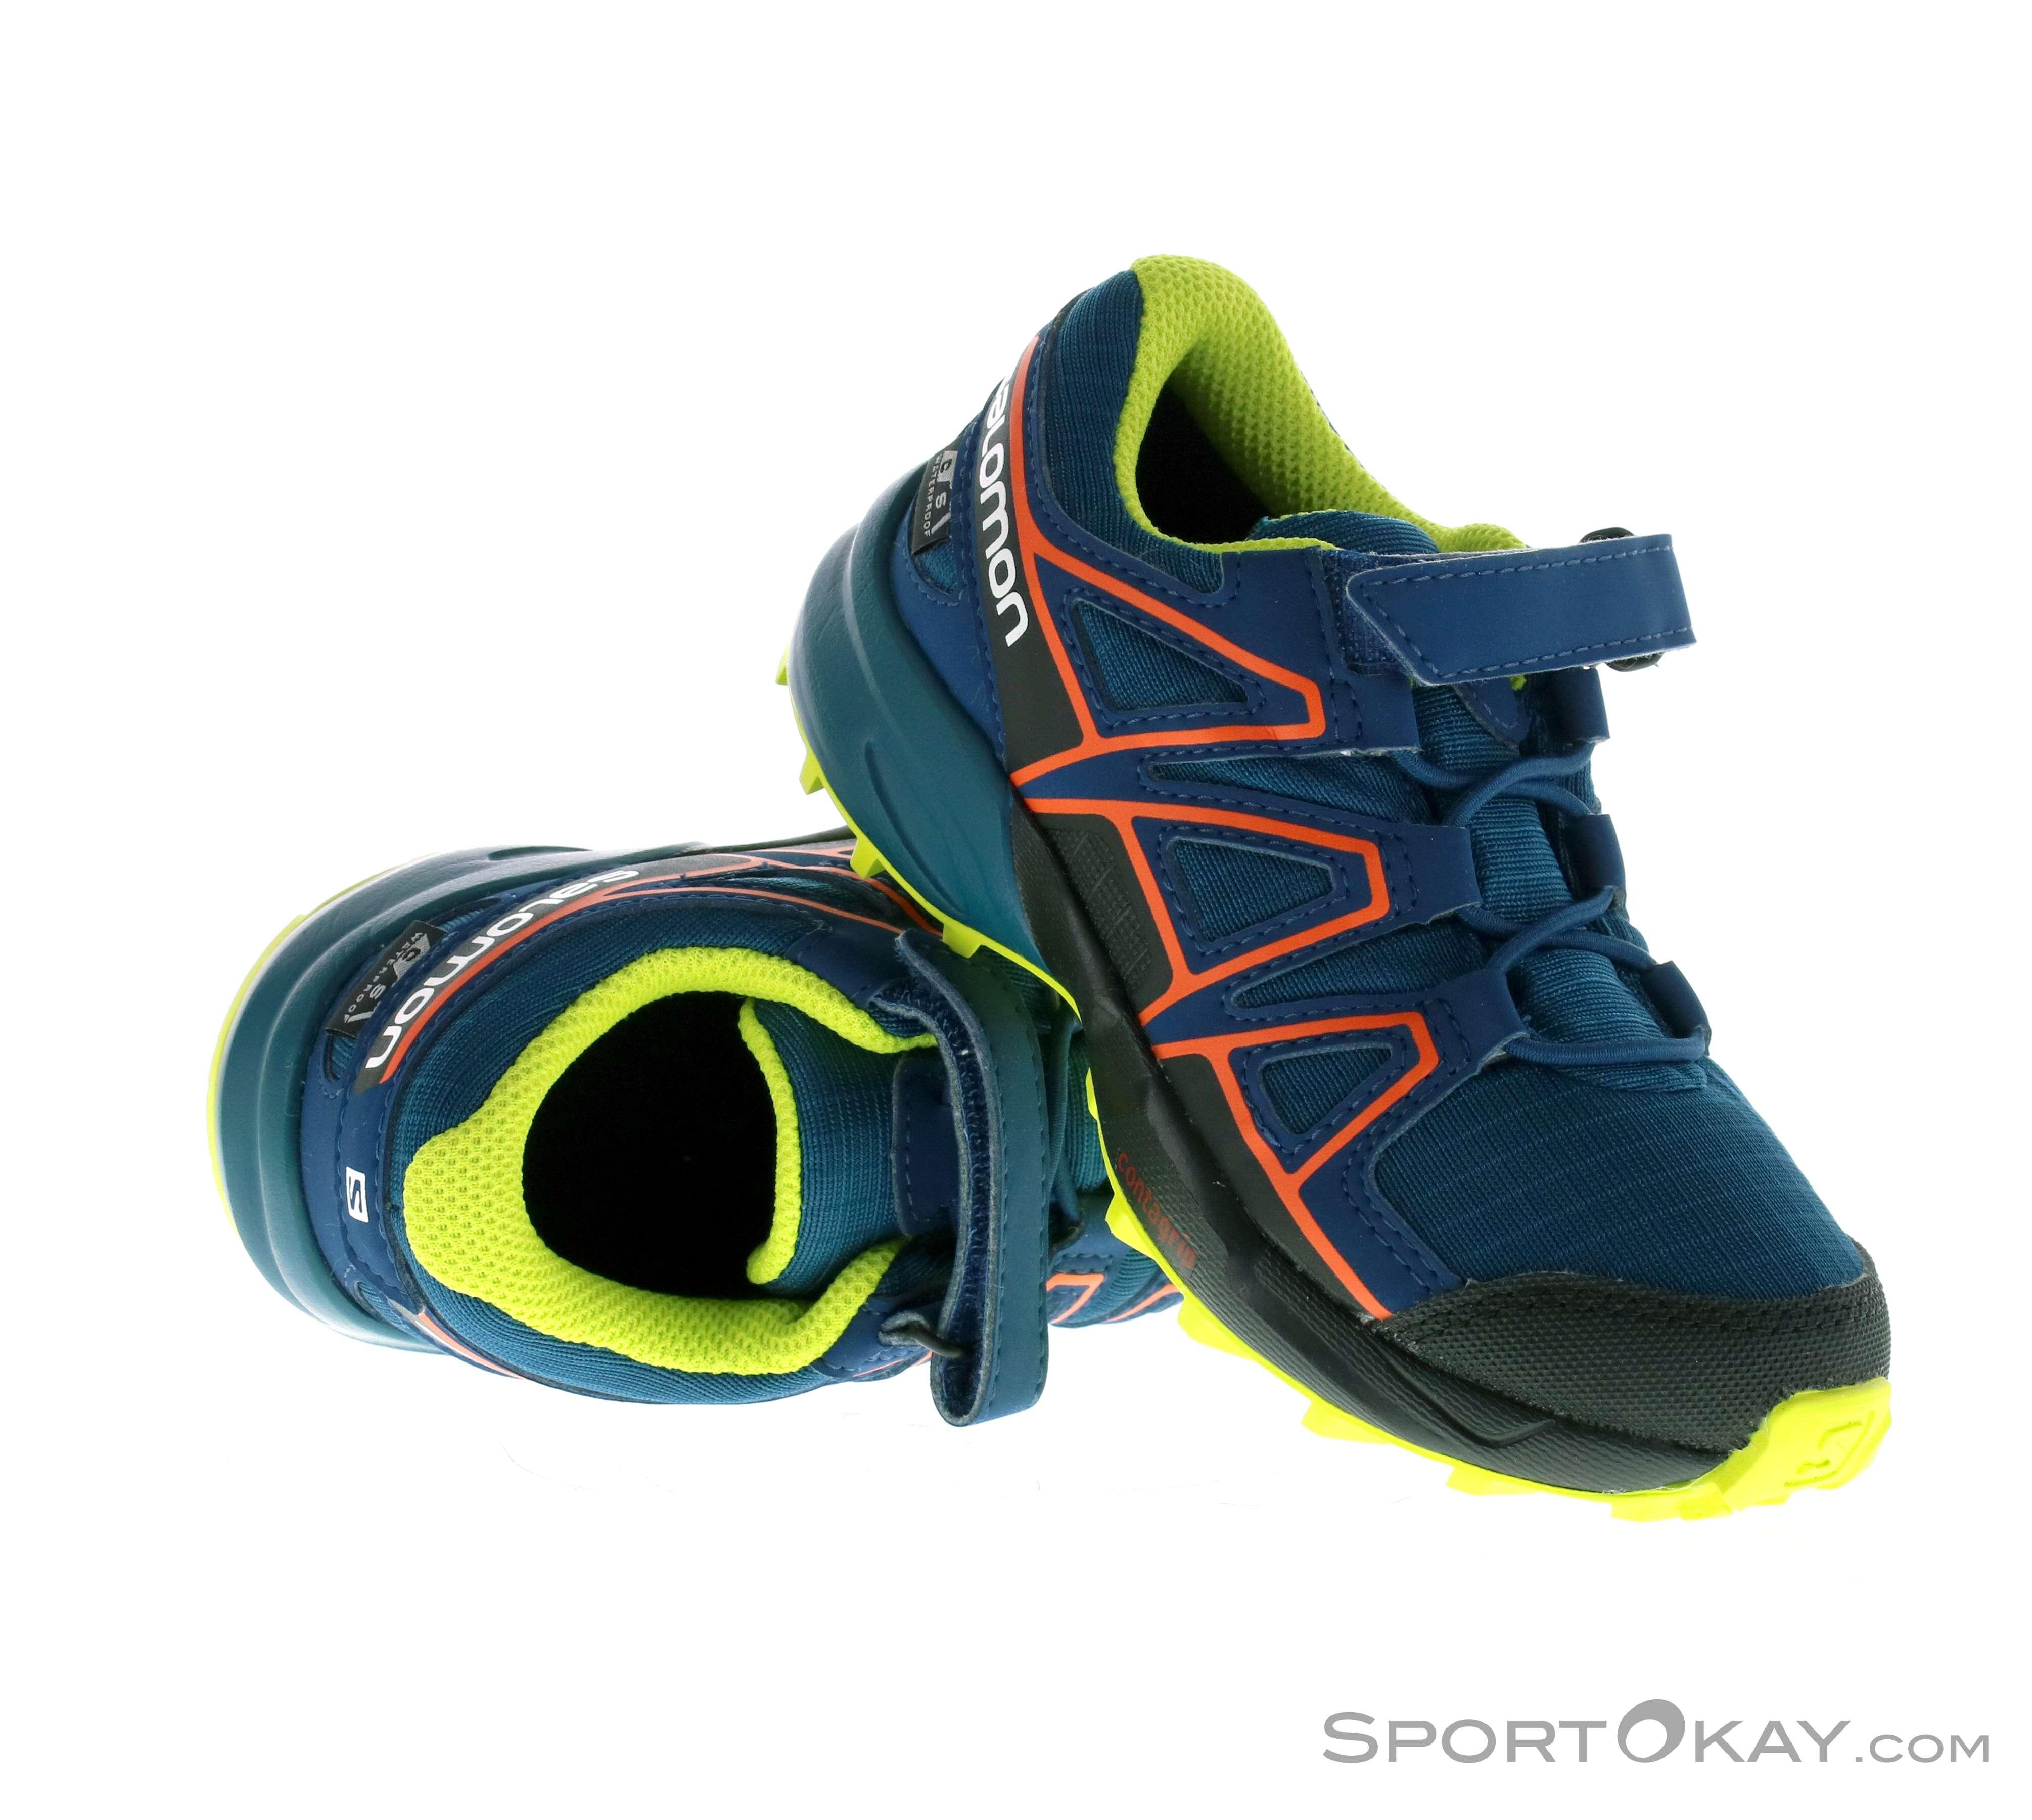 Salomon Salomon Speedcross CSWP K Kids Trail Running Shoes